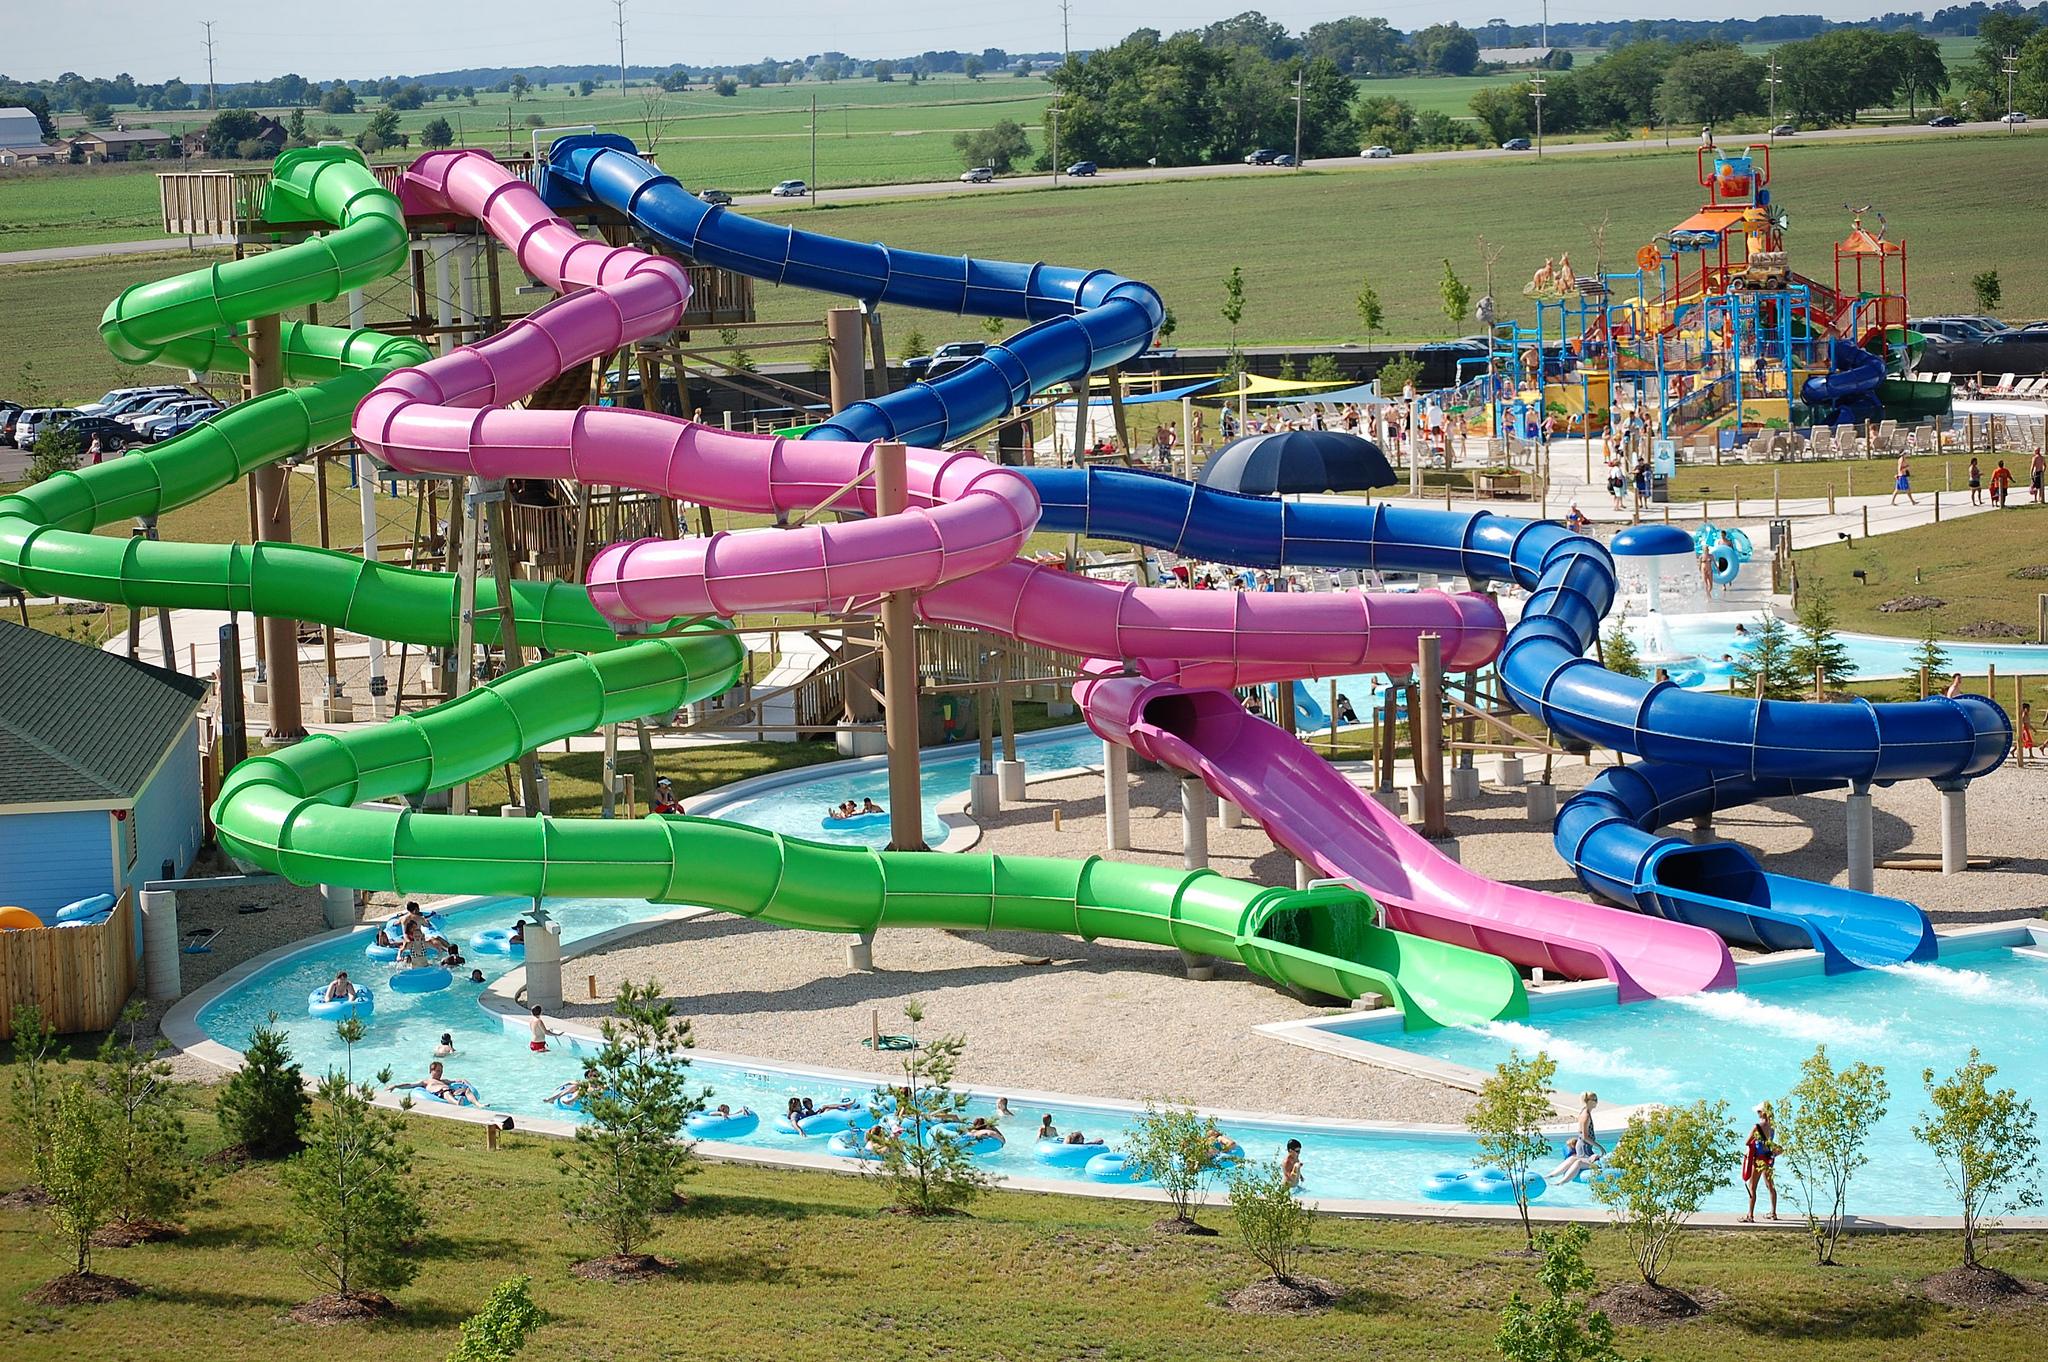 Top 5 Reason to Have Summer Fun at Raging Waves Waterpark